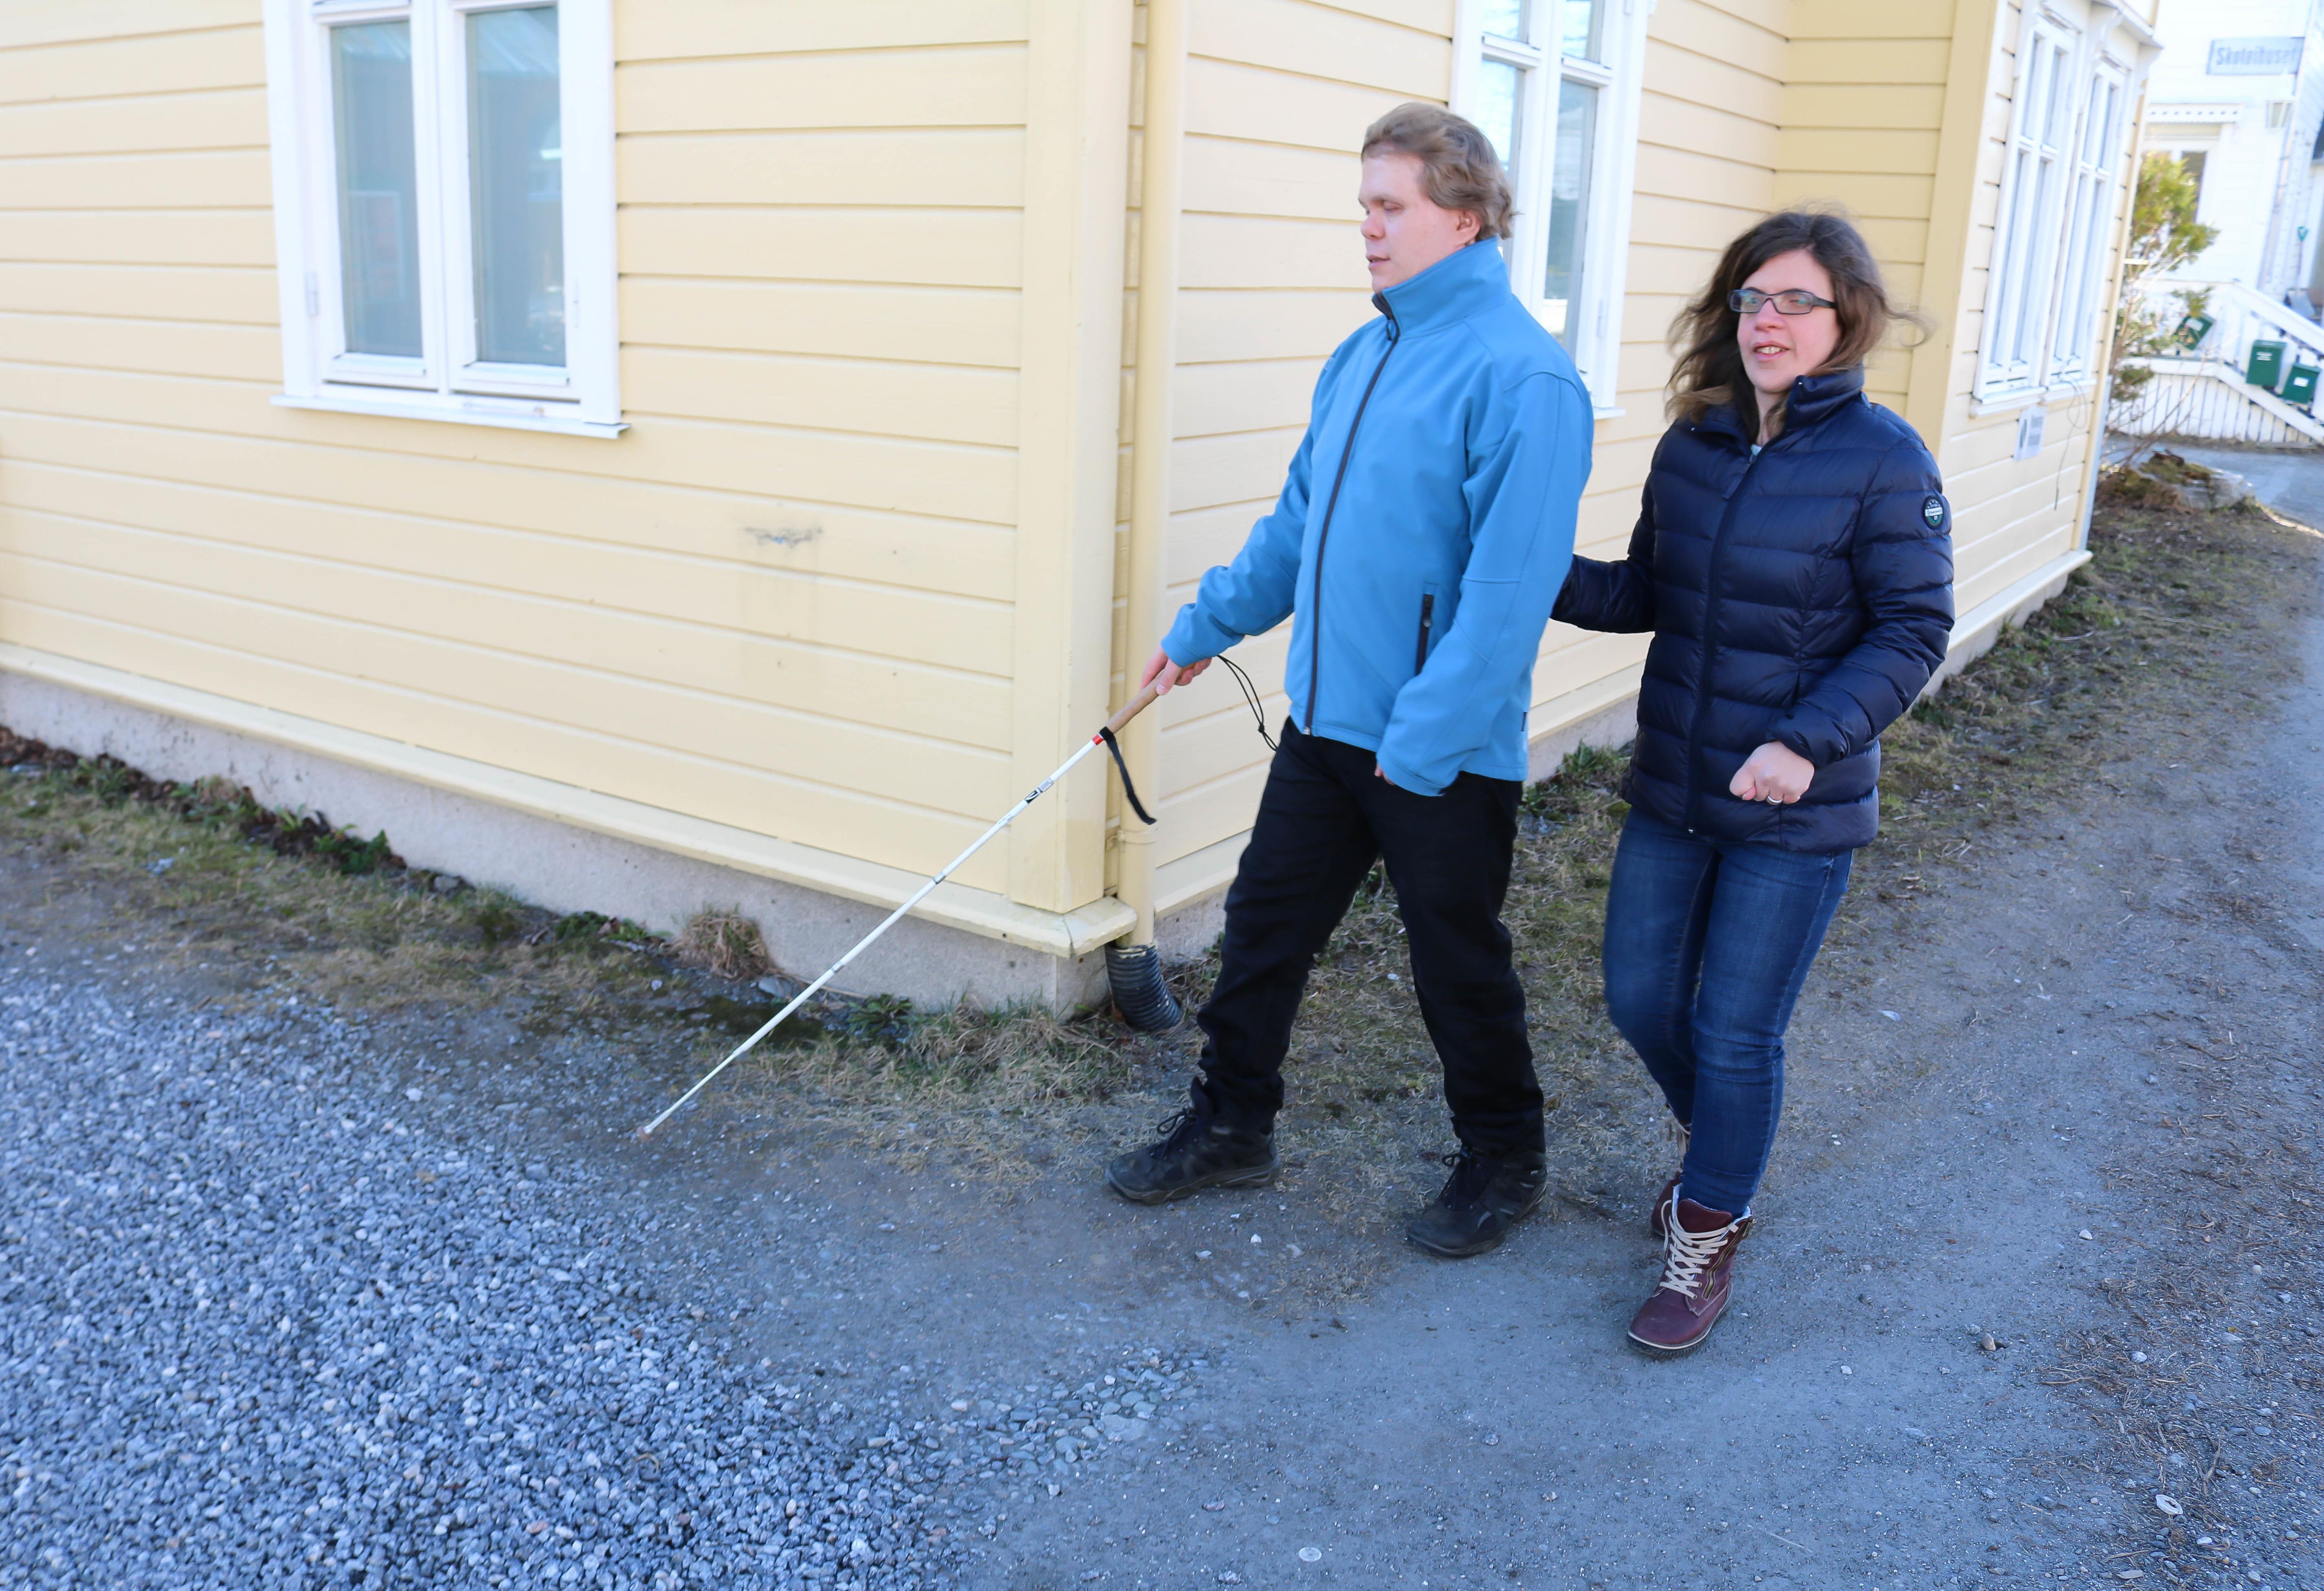 Døvblind mann med blindestokk går med sin kone forbi et hushjørne.